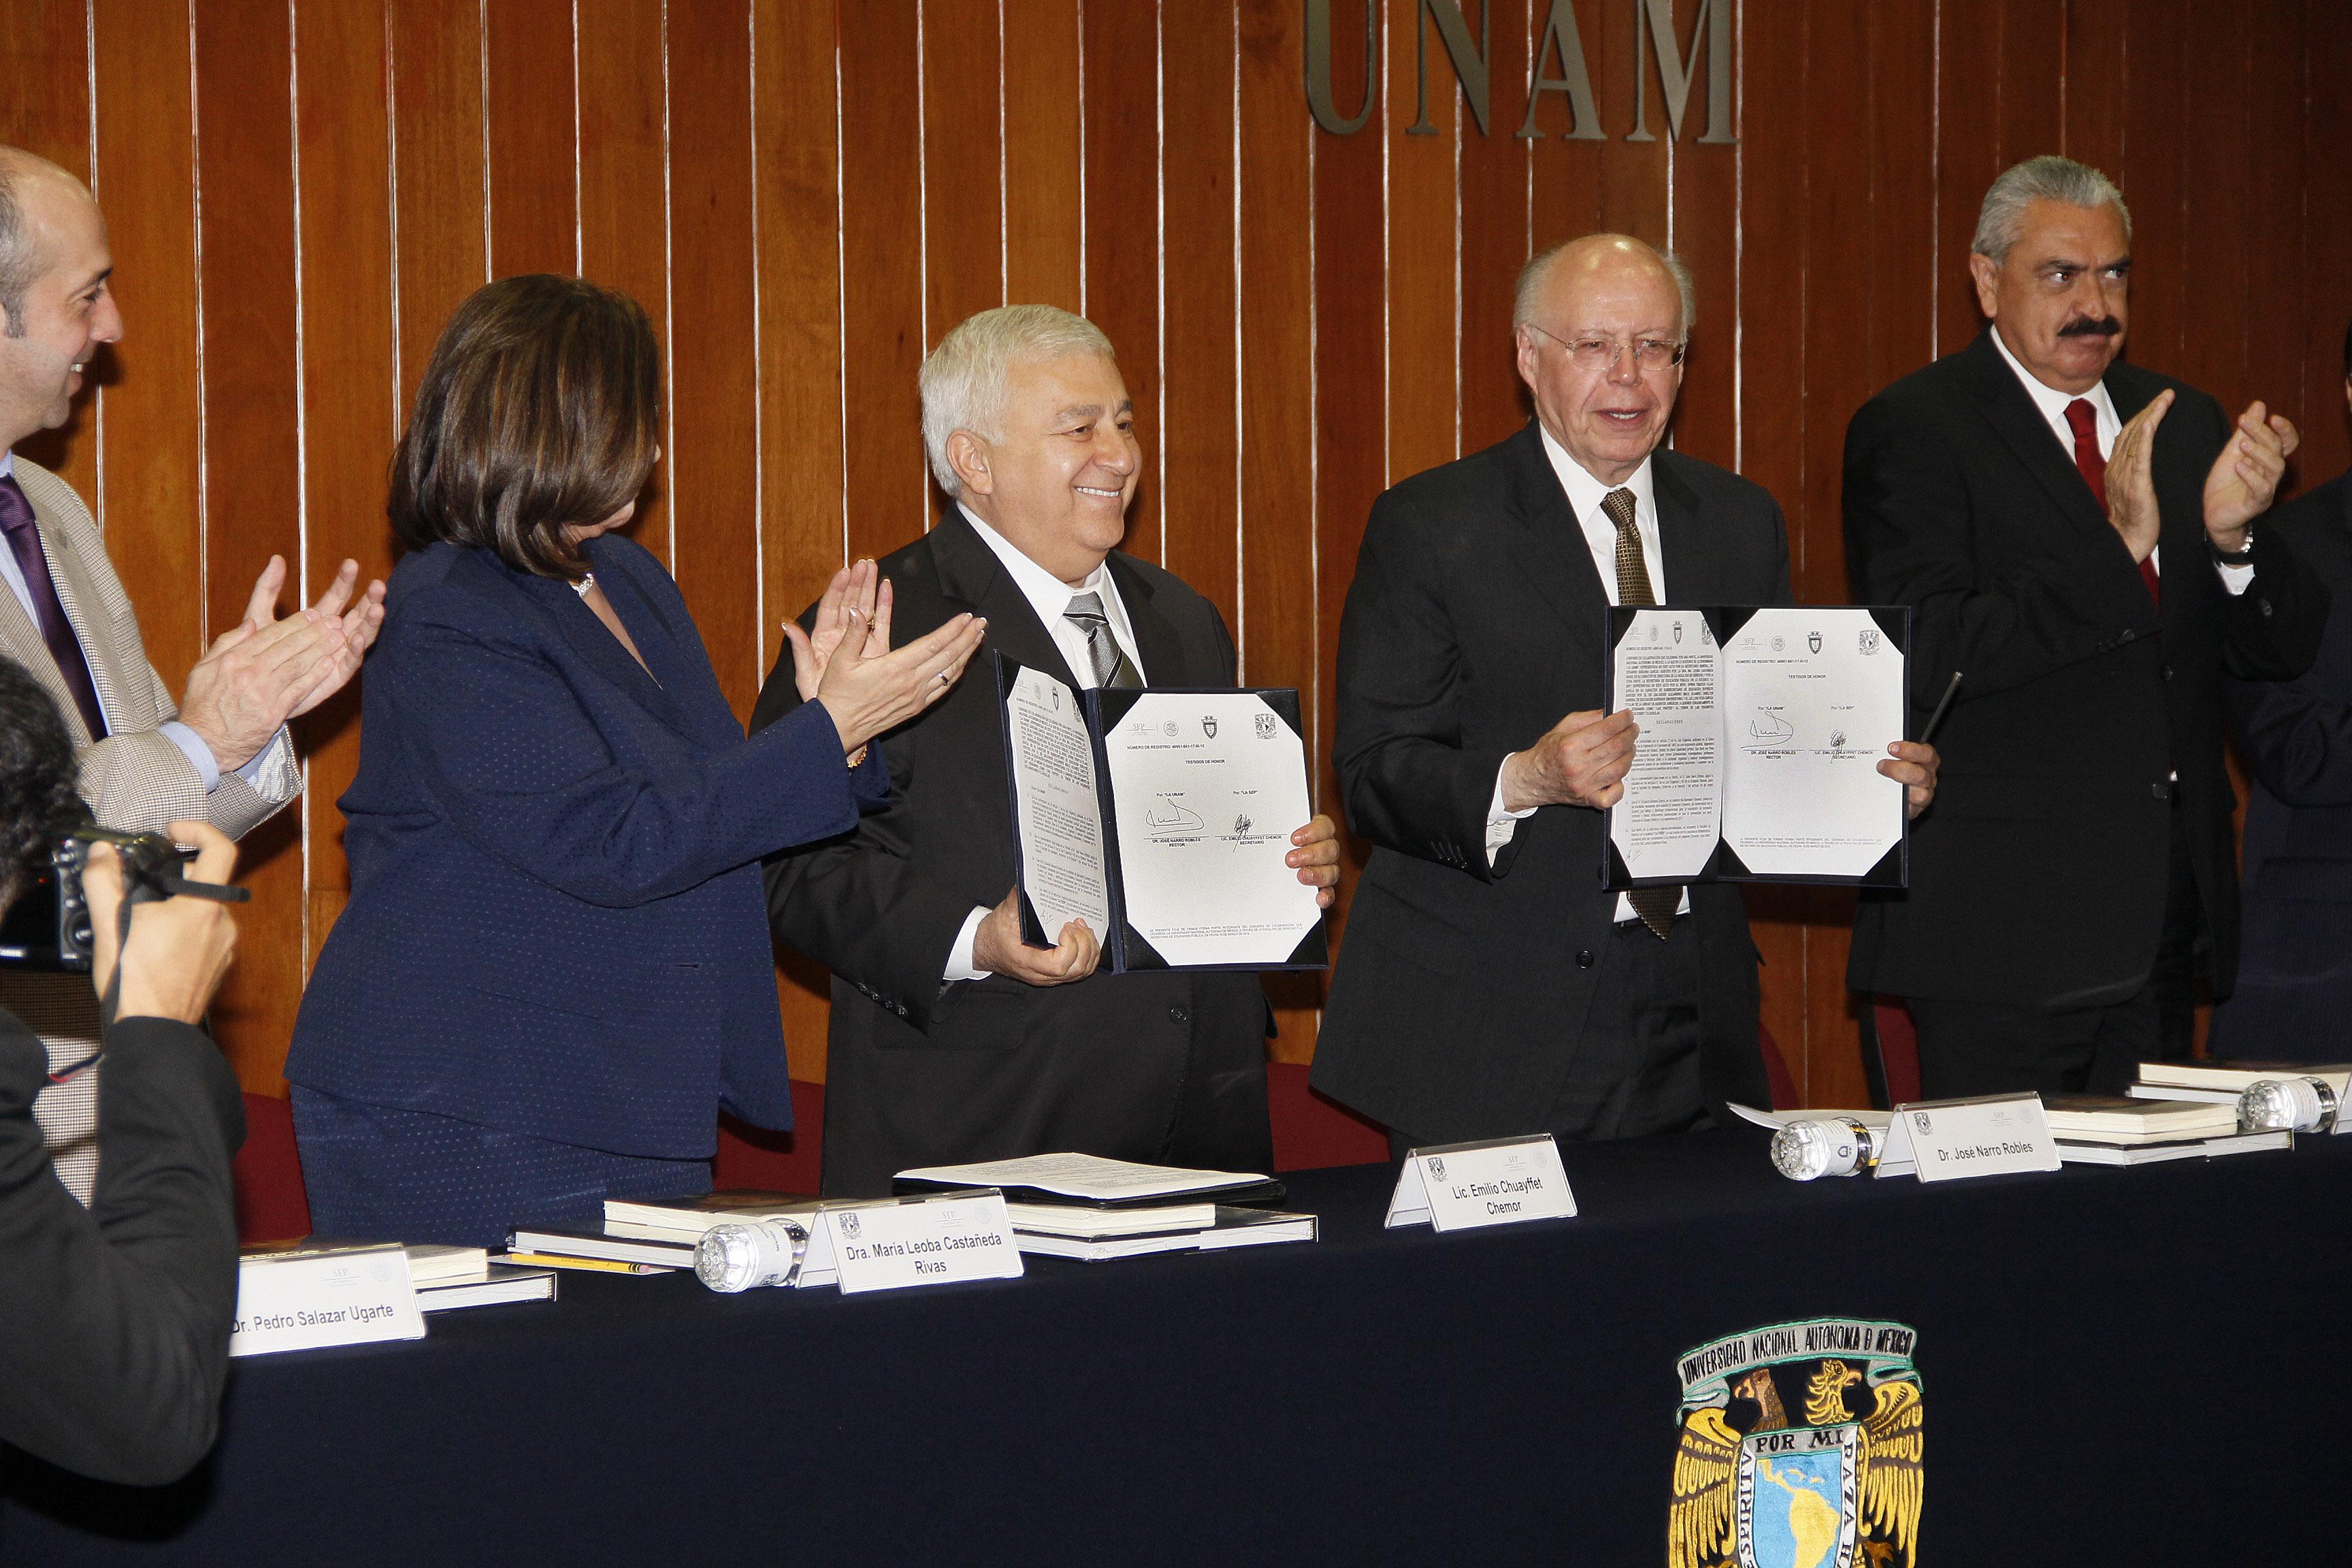 Firman convenio Chuayffet y Narro en materia de investigación jurídica